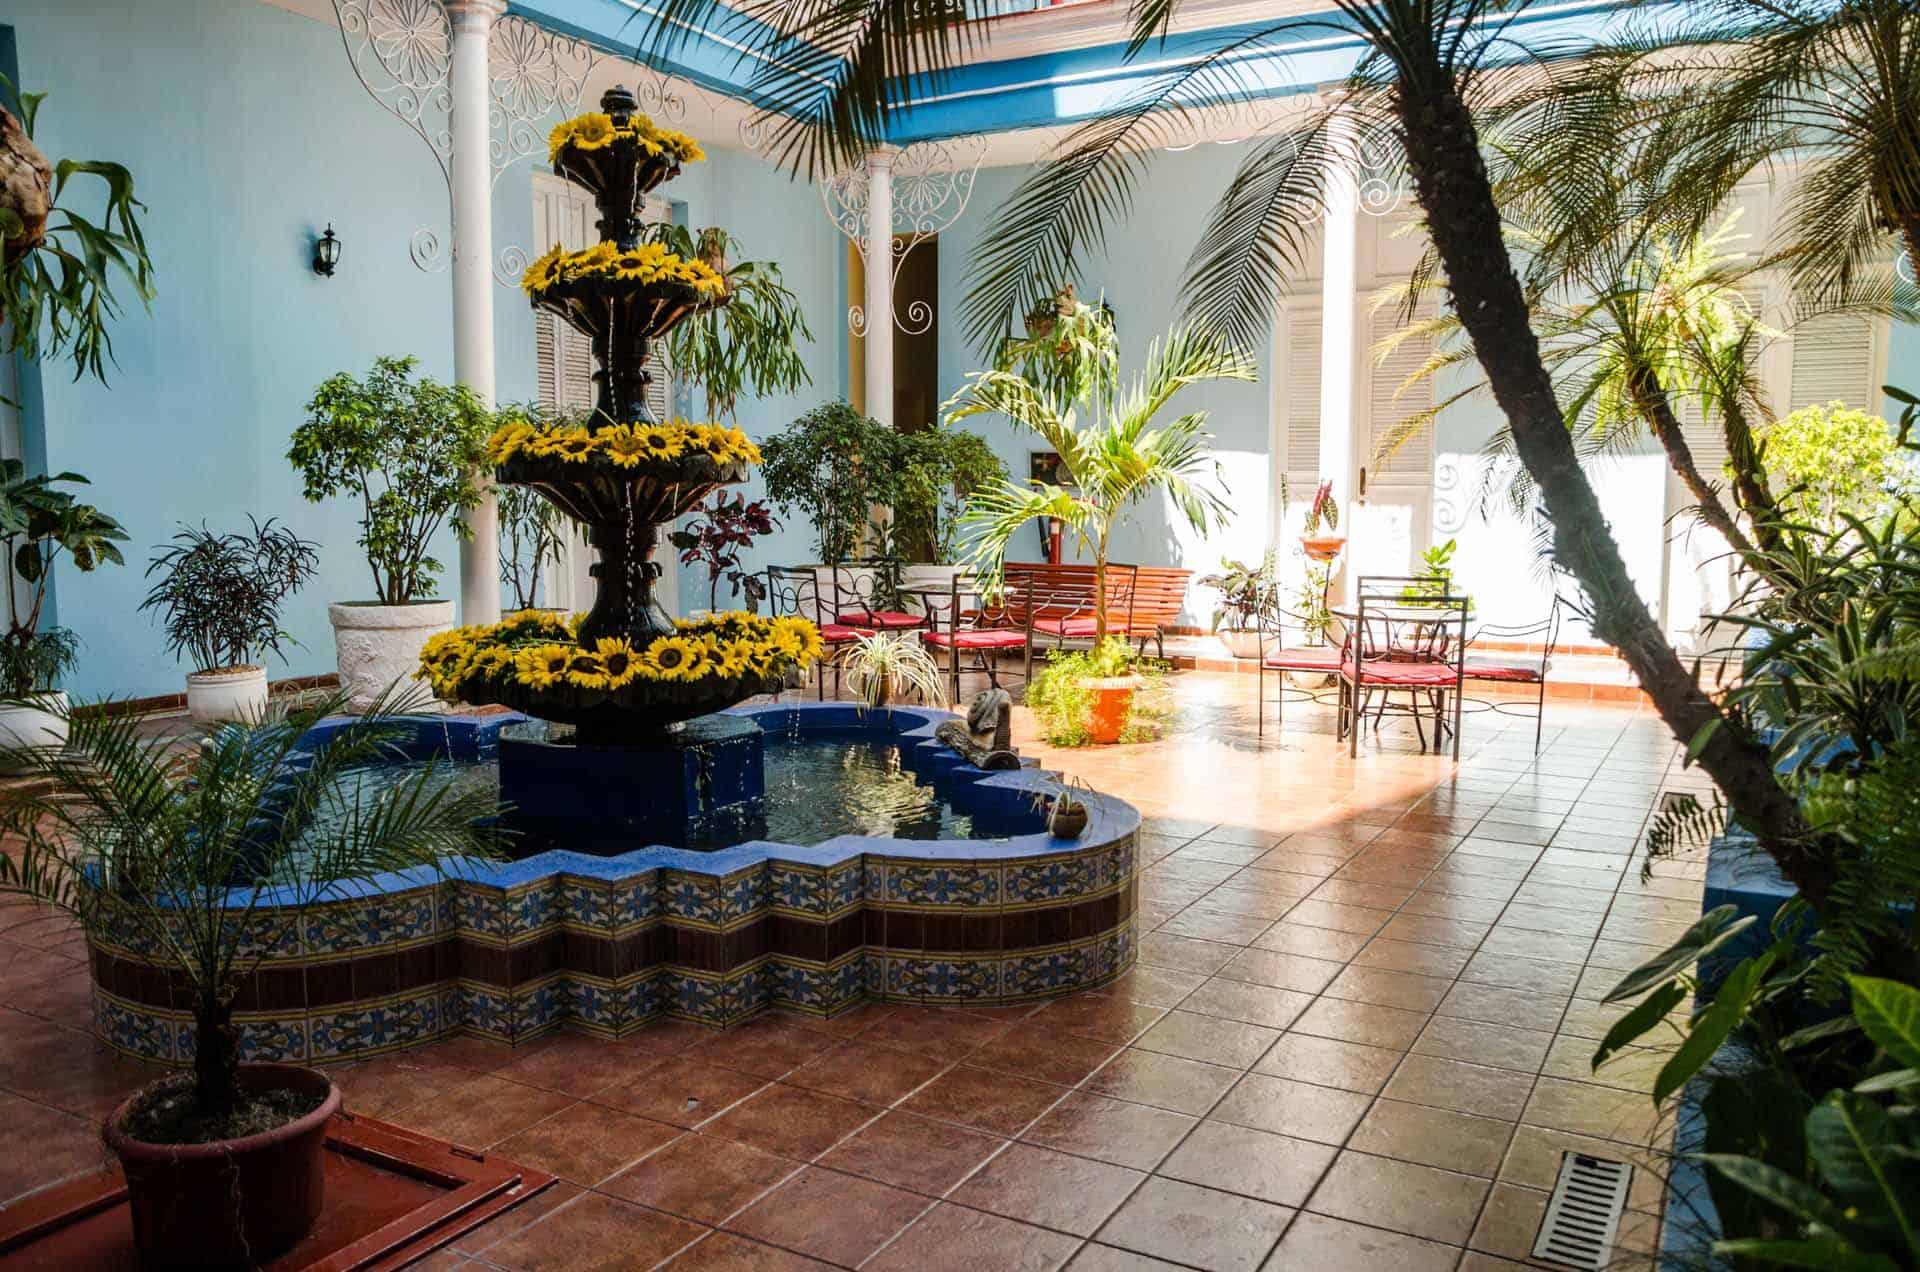 H1146 Hotel La Union Cienfuegos 01 cuba autrement